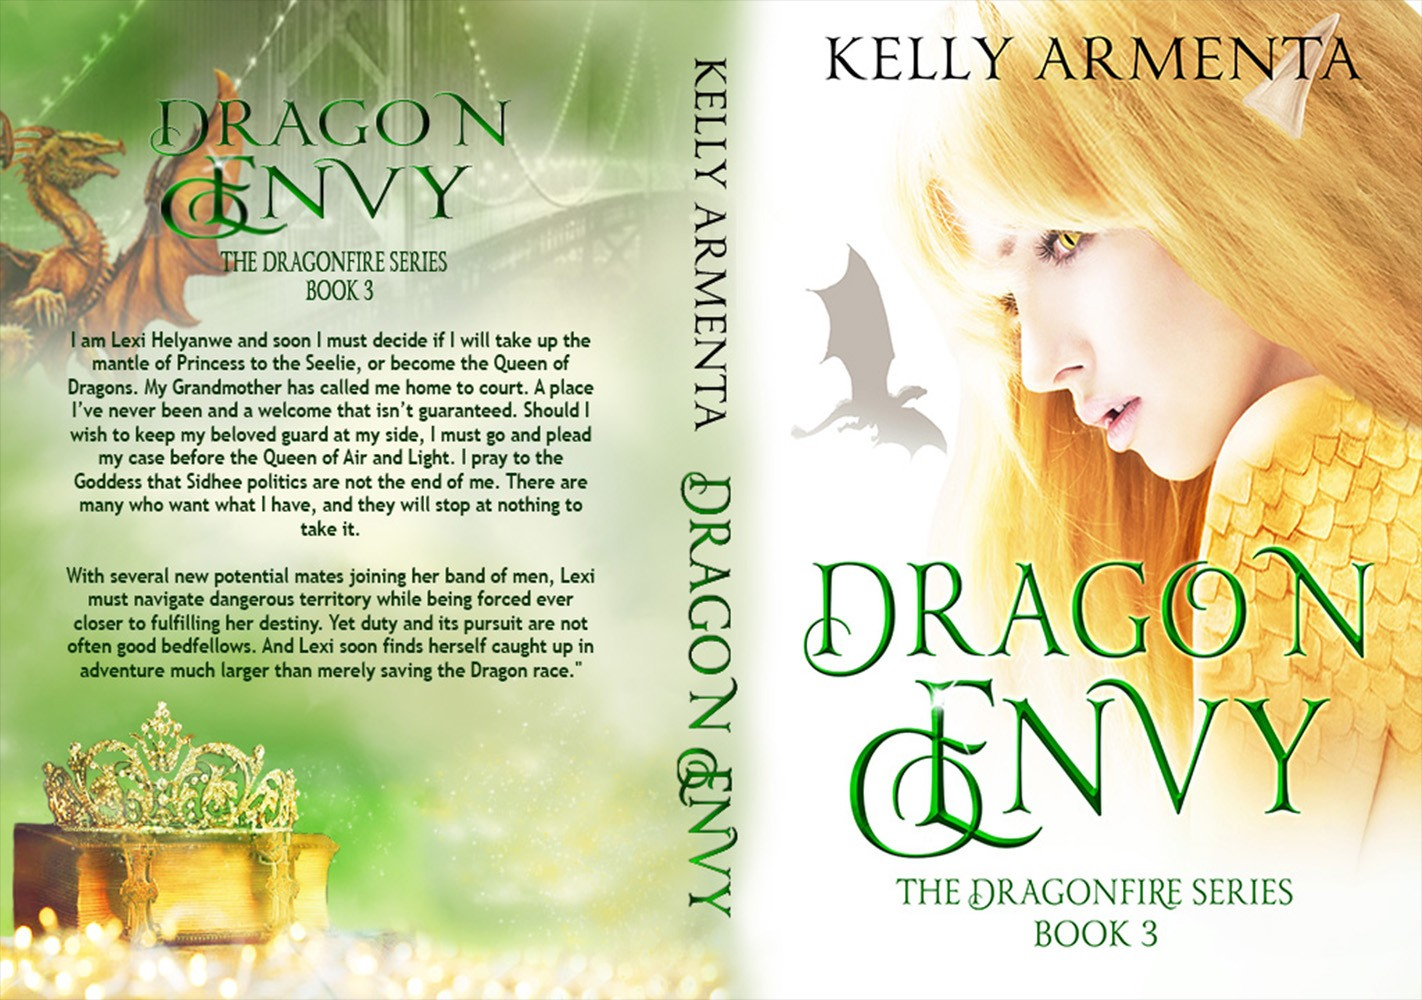 Design my Dragon Envy Book Cover